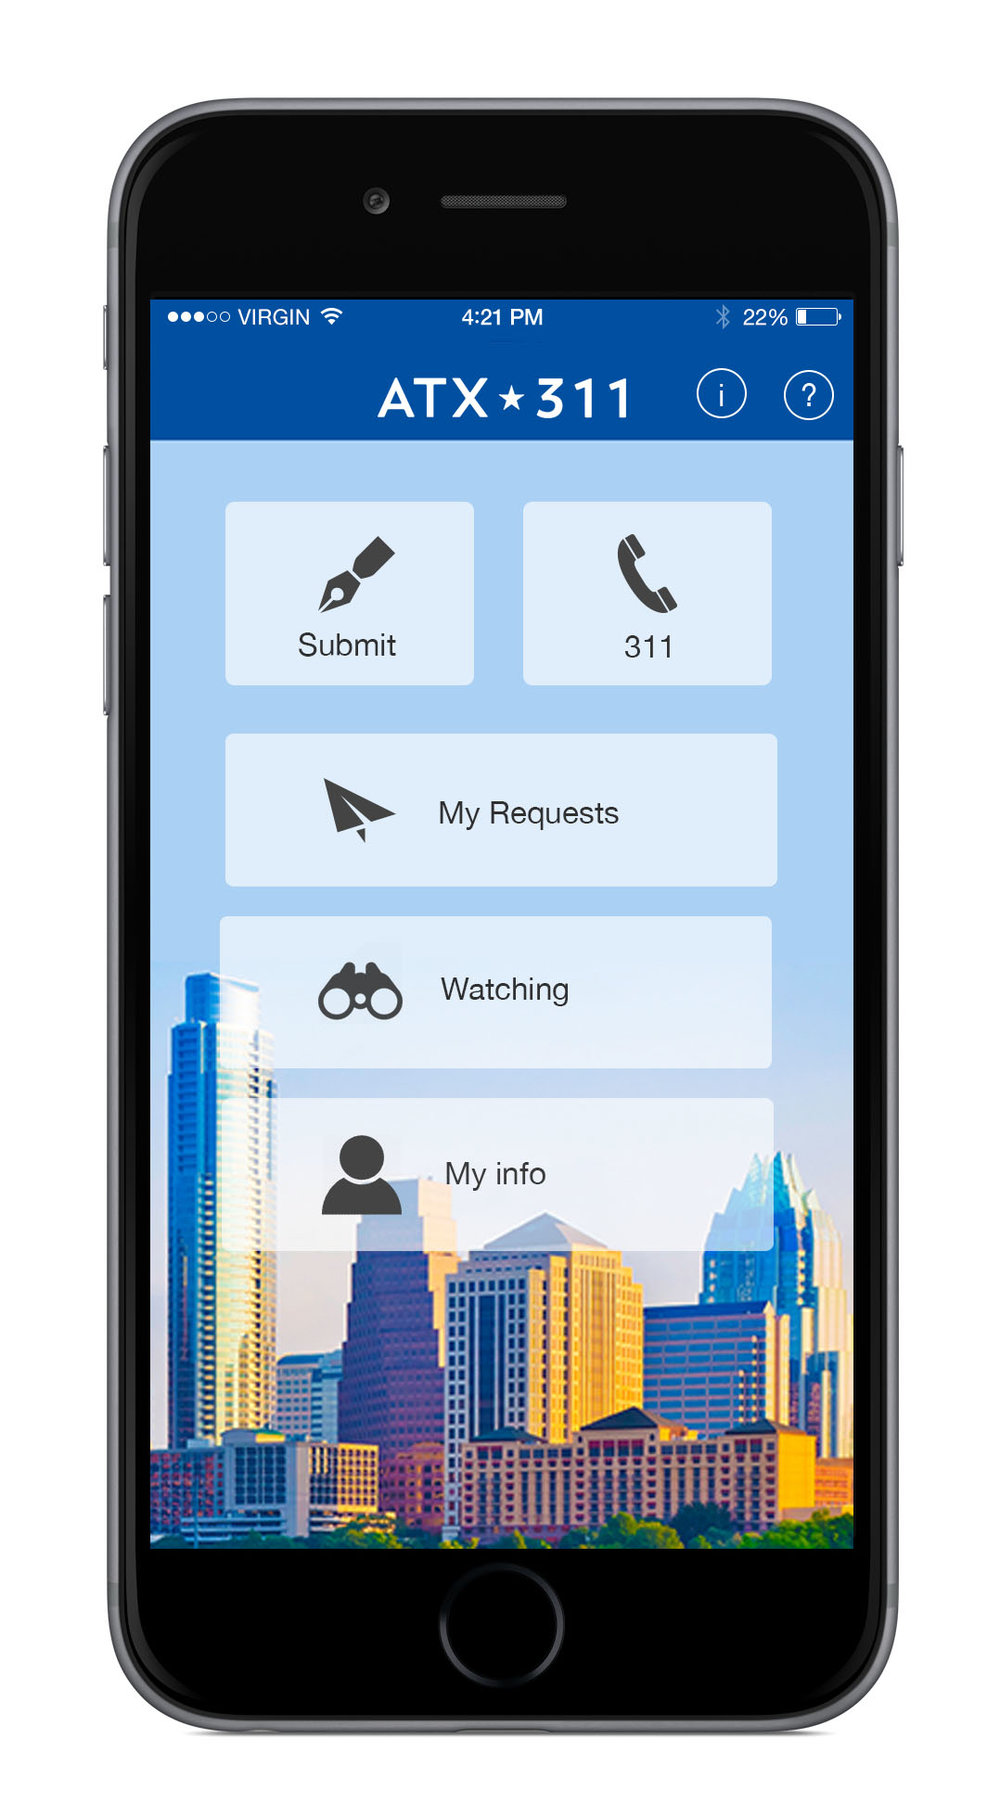 atx-311-app-mockup.jpg